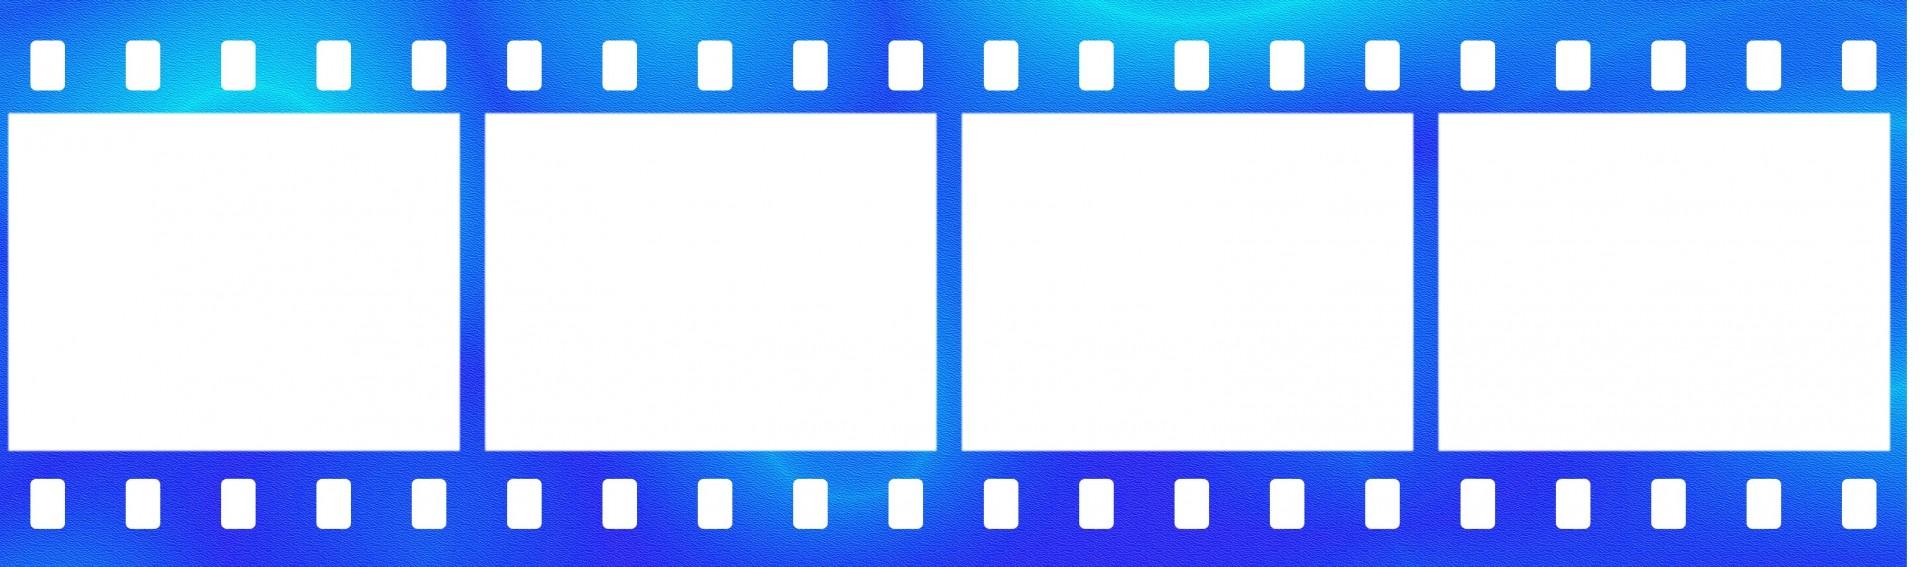 1920x567 Blue Film Strip